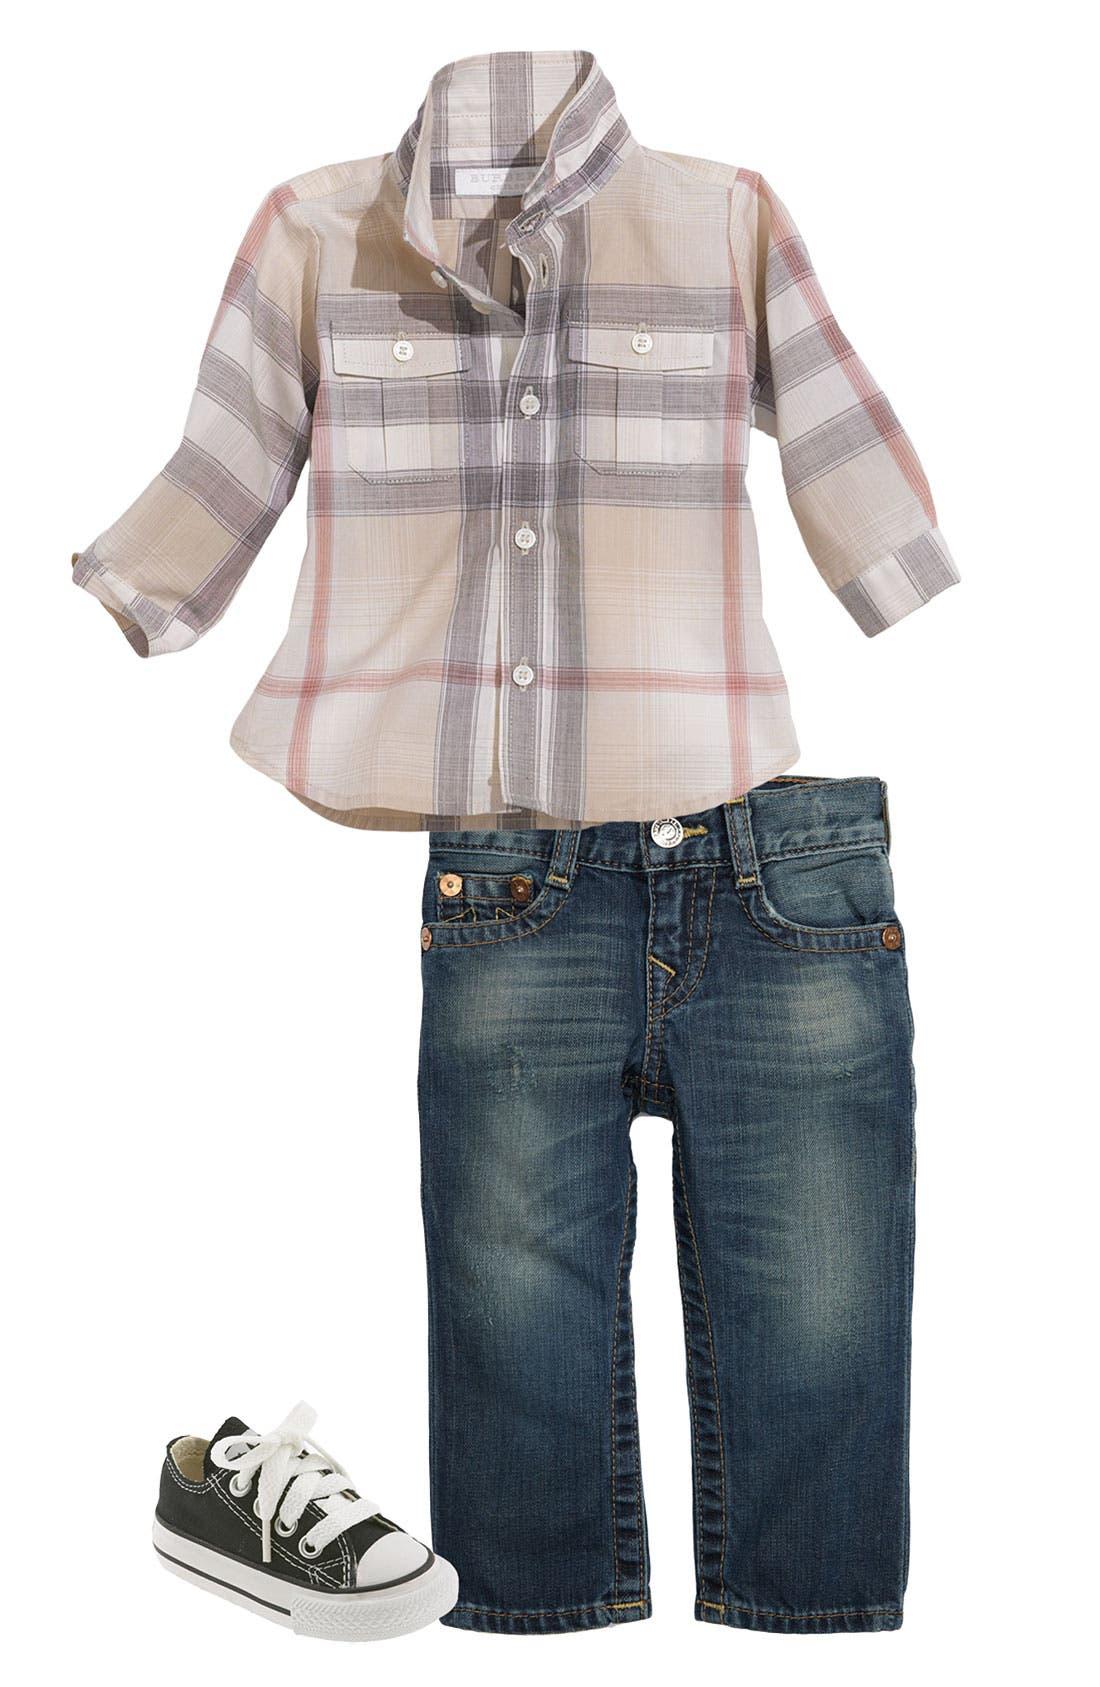 Main Image - Burberry Shirt & True Religion Brand Jeans Straight Leg Jeans (Infant)